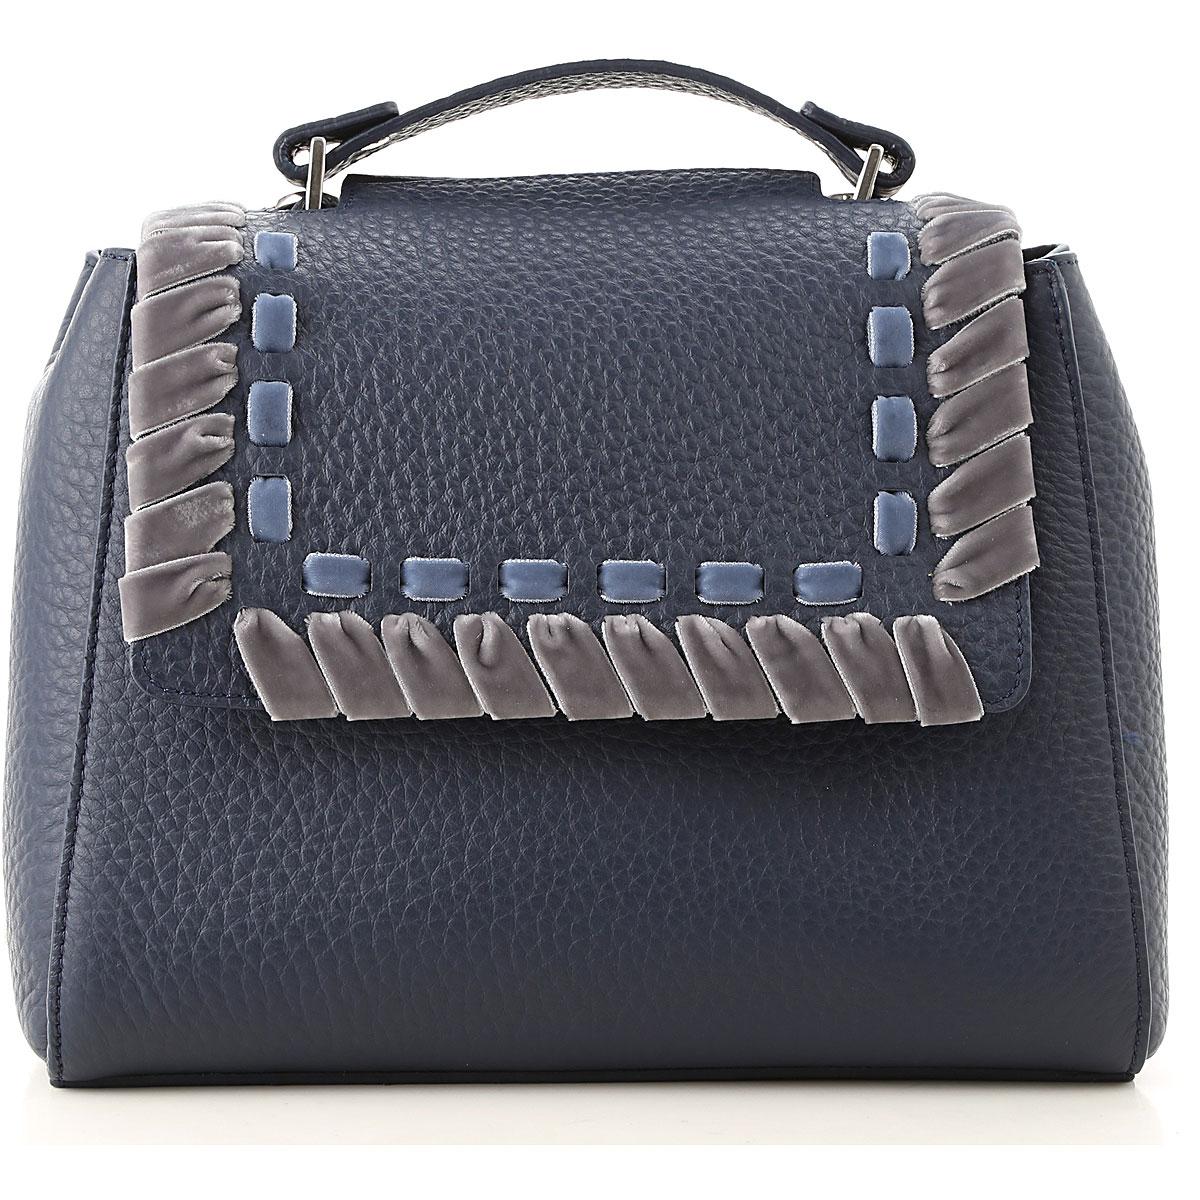 Orciani Top Handle Handbag On Sale, Blue, Leather, 2019